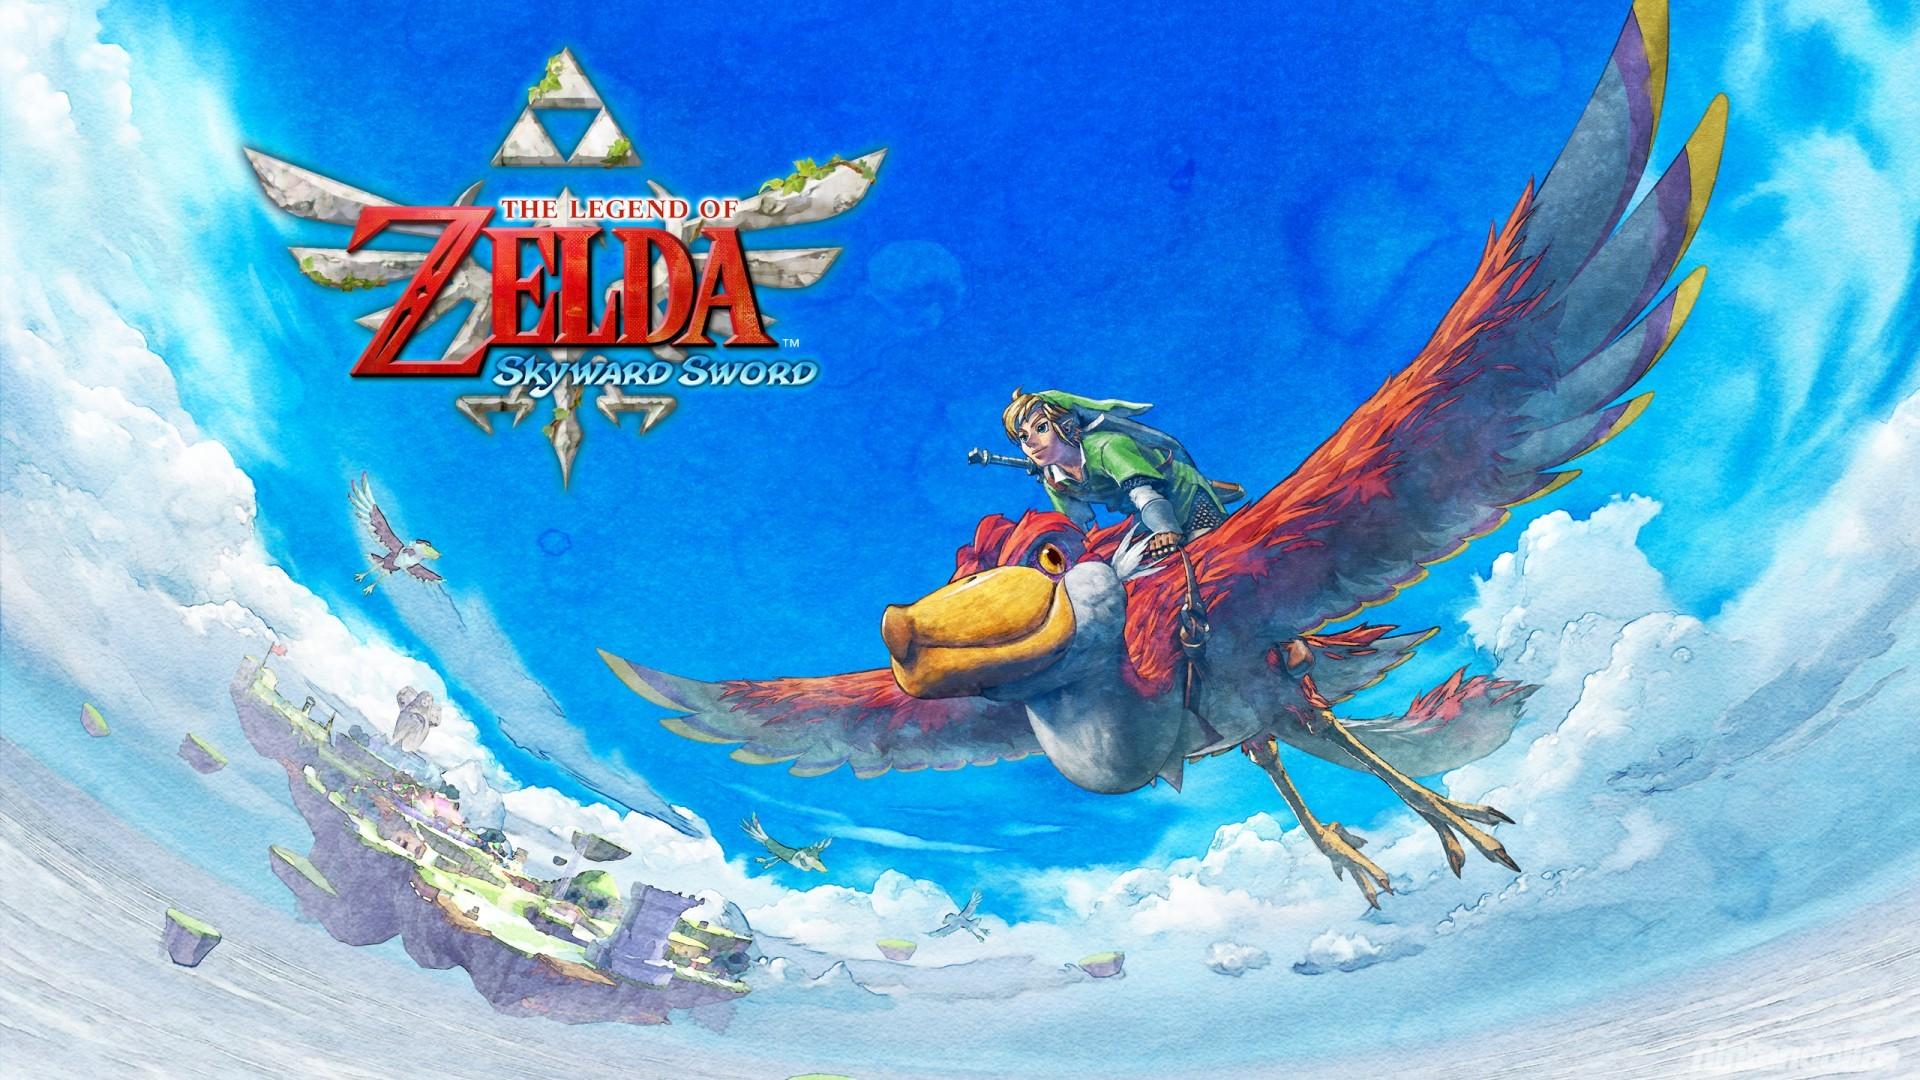 Fantastic Backgrounds Collection: Legend Of Zelda Wallpapers, Legend Of Zelda  Desktop Wallpapers